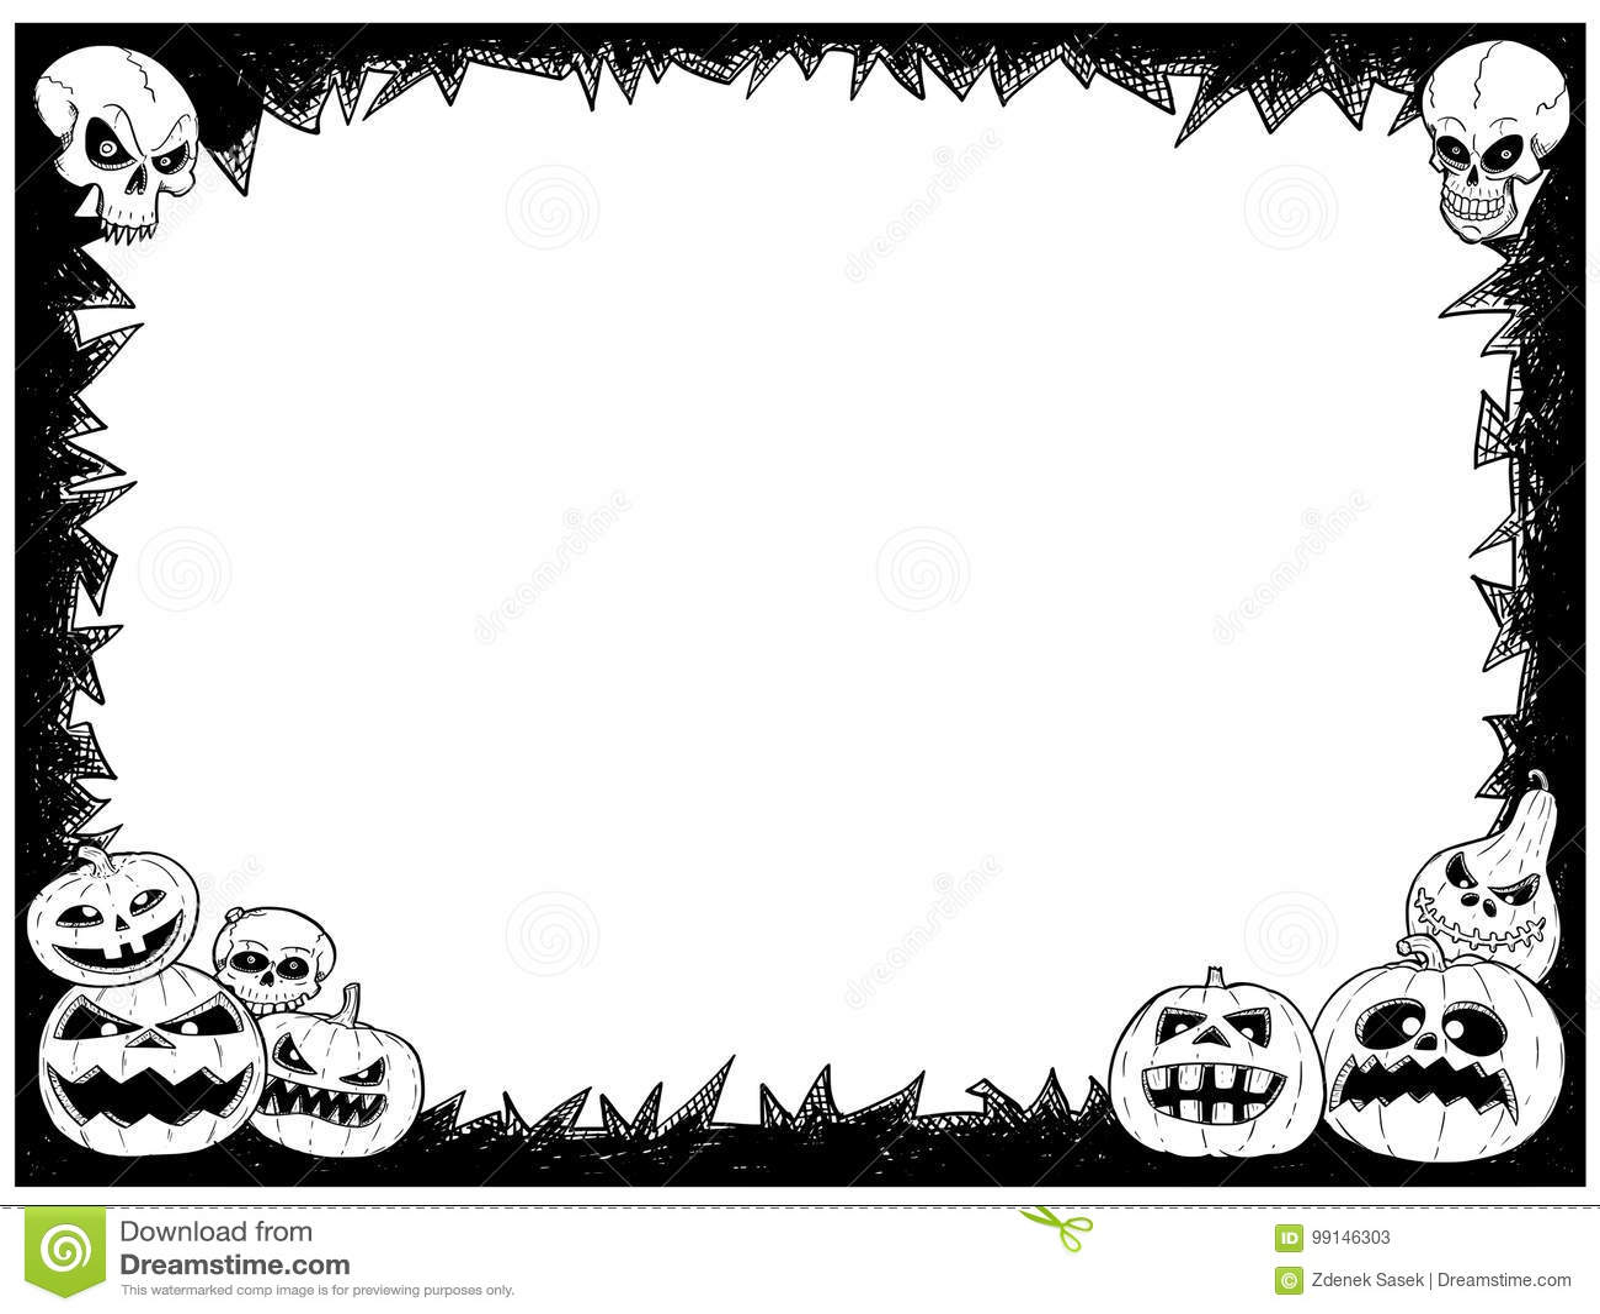 Halloween Frame With Skulls And Pumpkins Stock Vector - Illustration ...